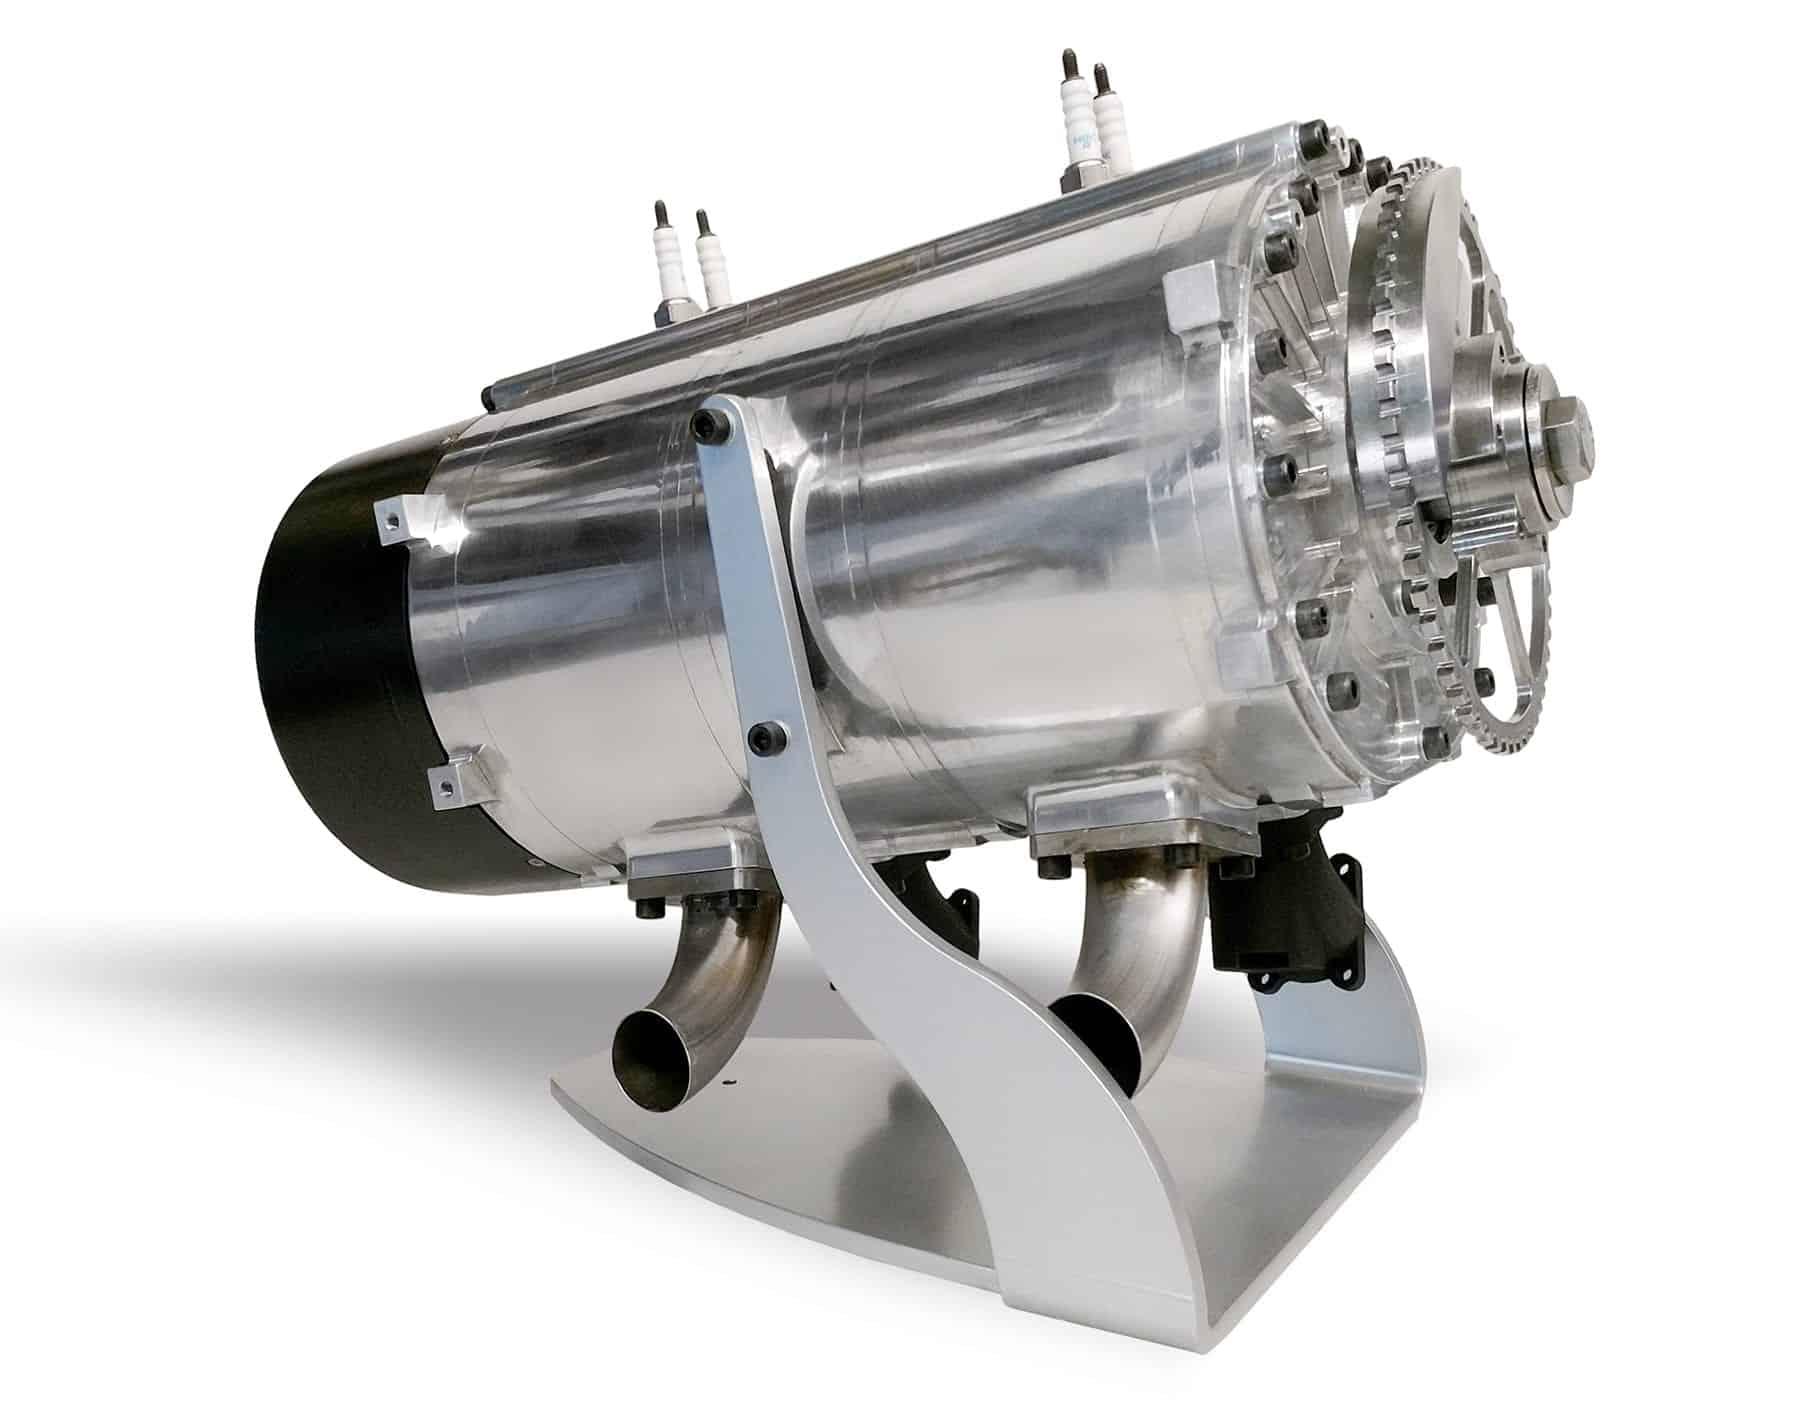 SP-480 SRE hybrid twin rotary UAV engine